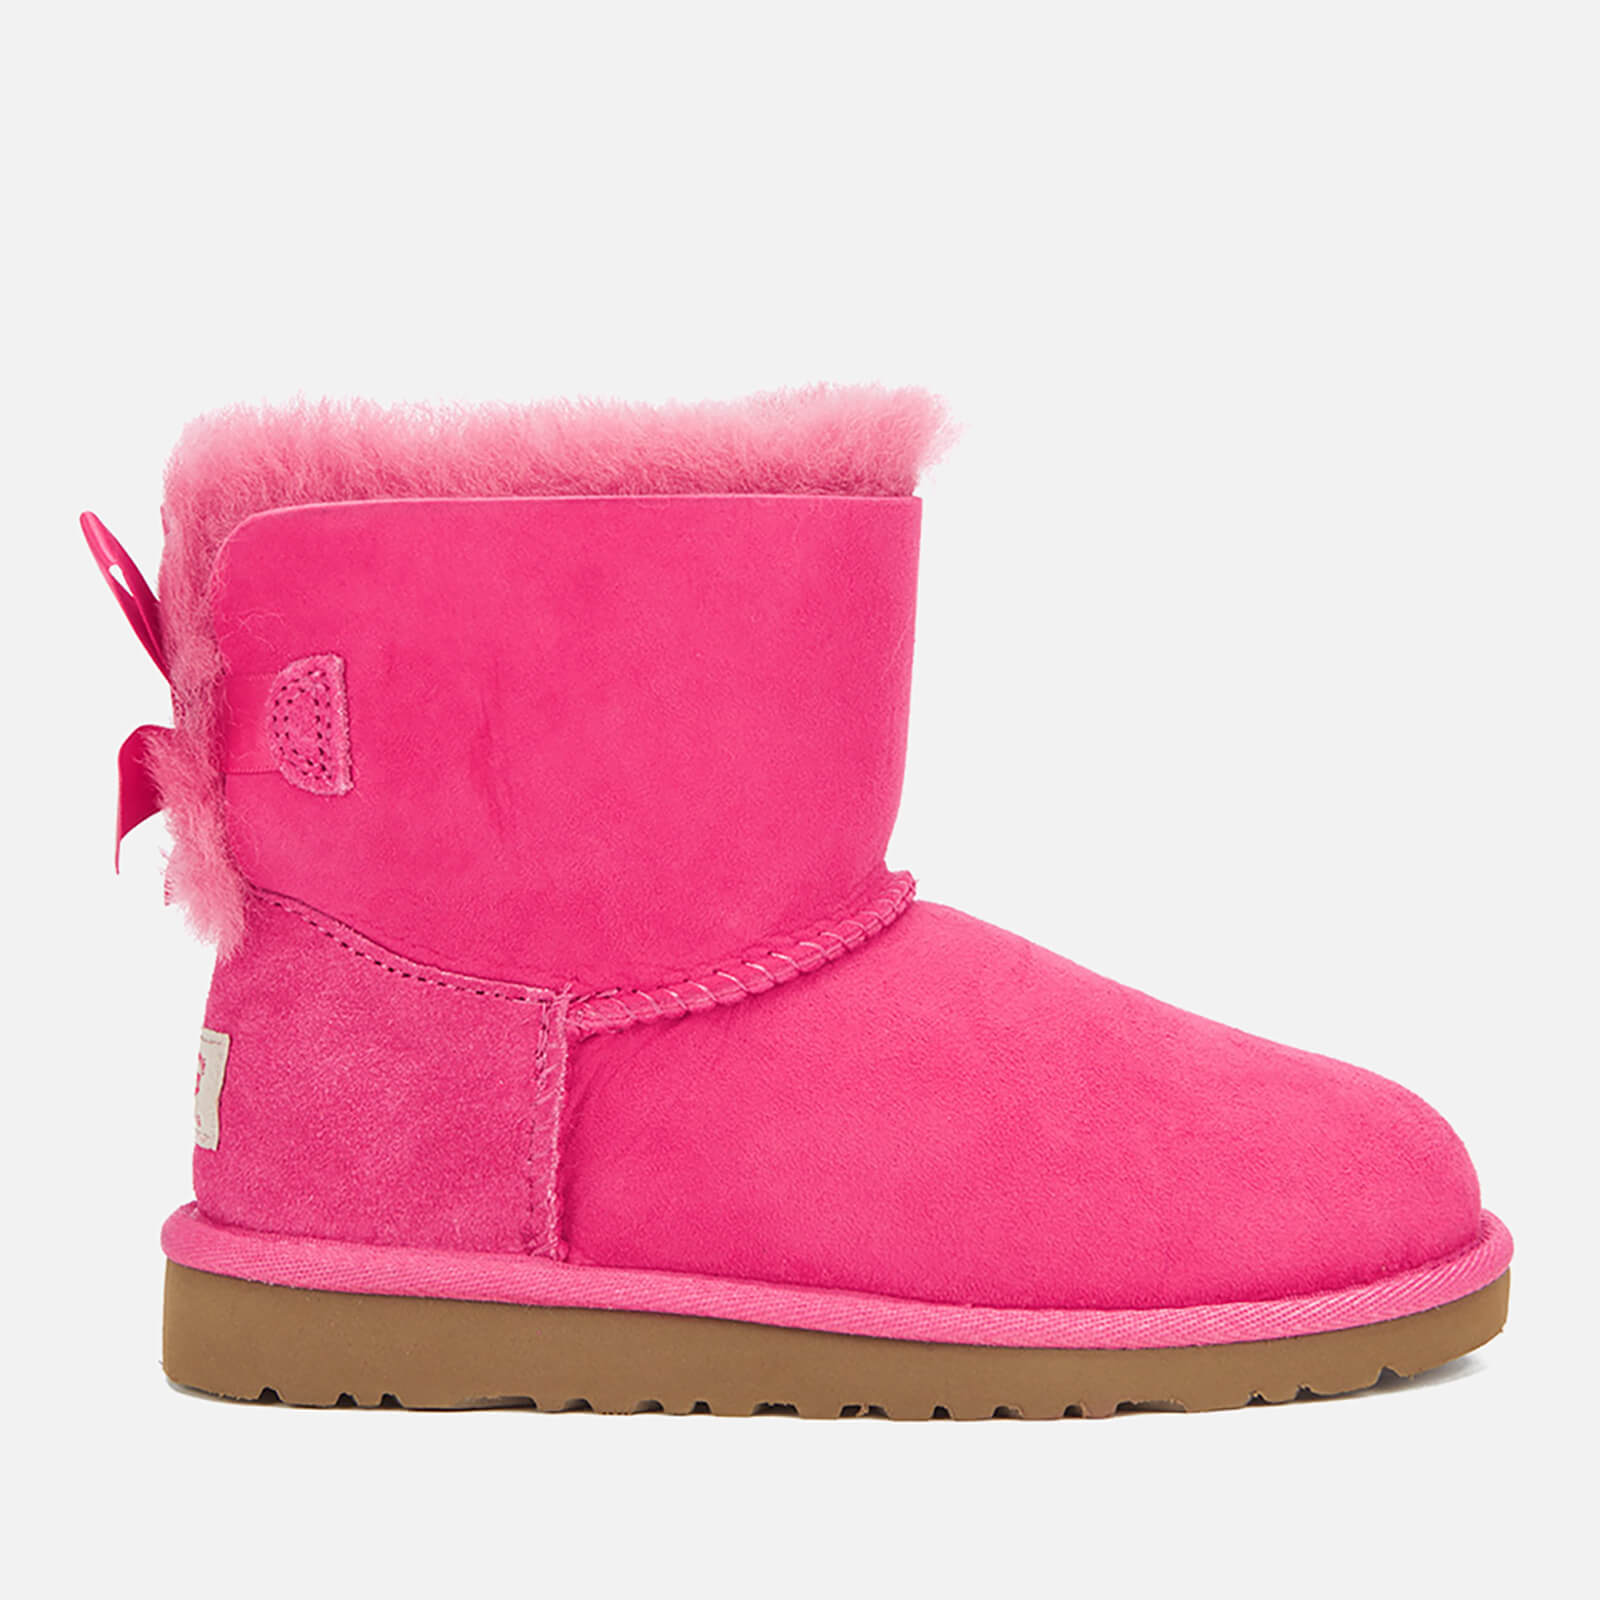 4367419edc4 UGG Kids' Mini Bailey Bow Boots - Cerise